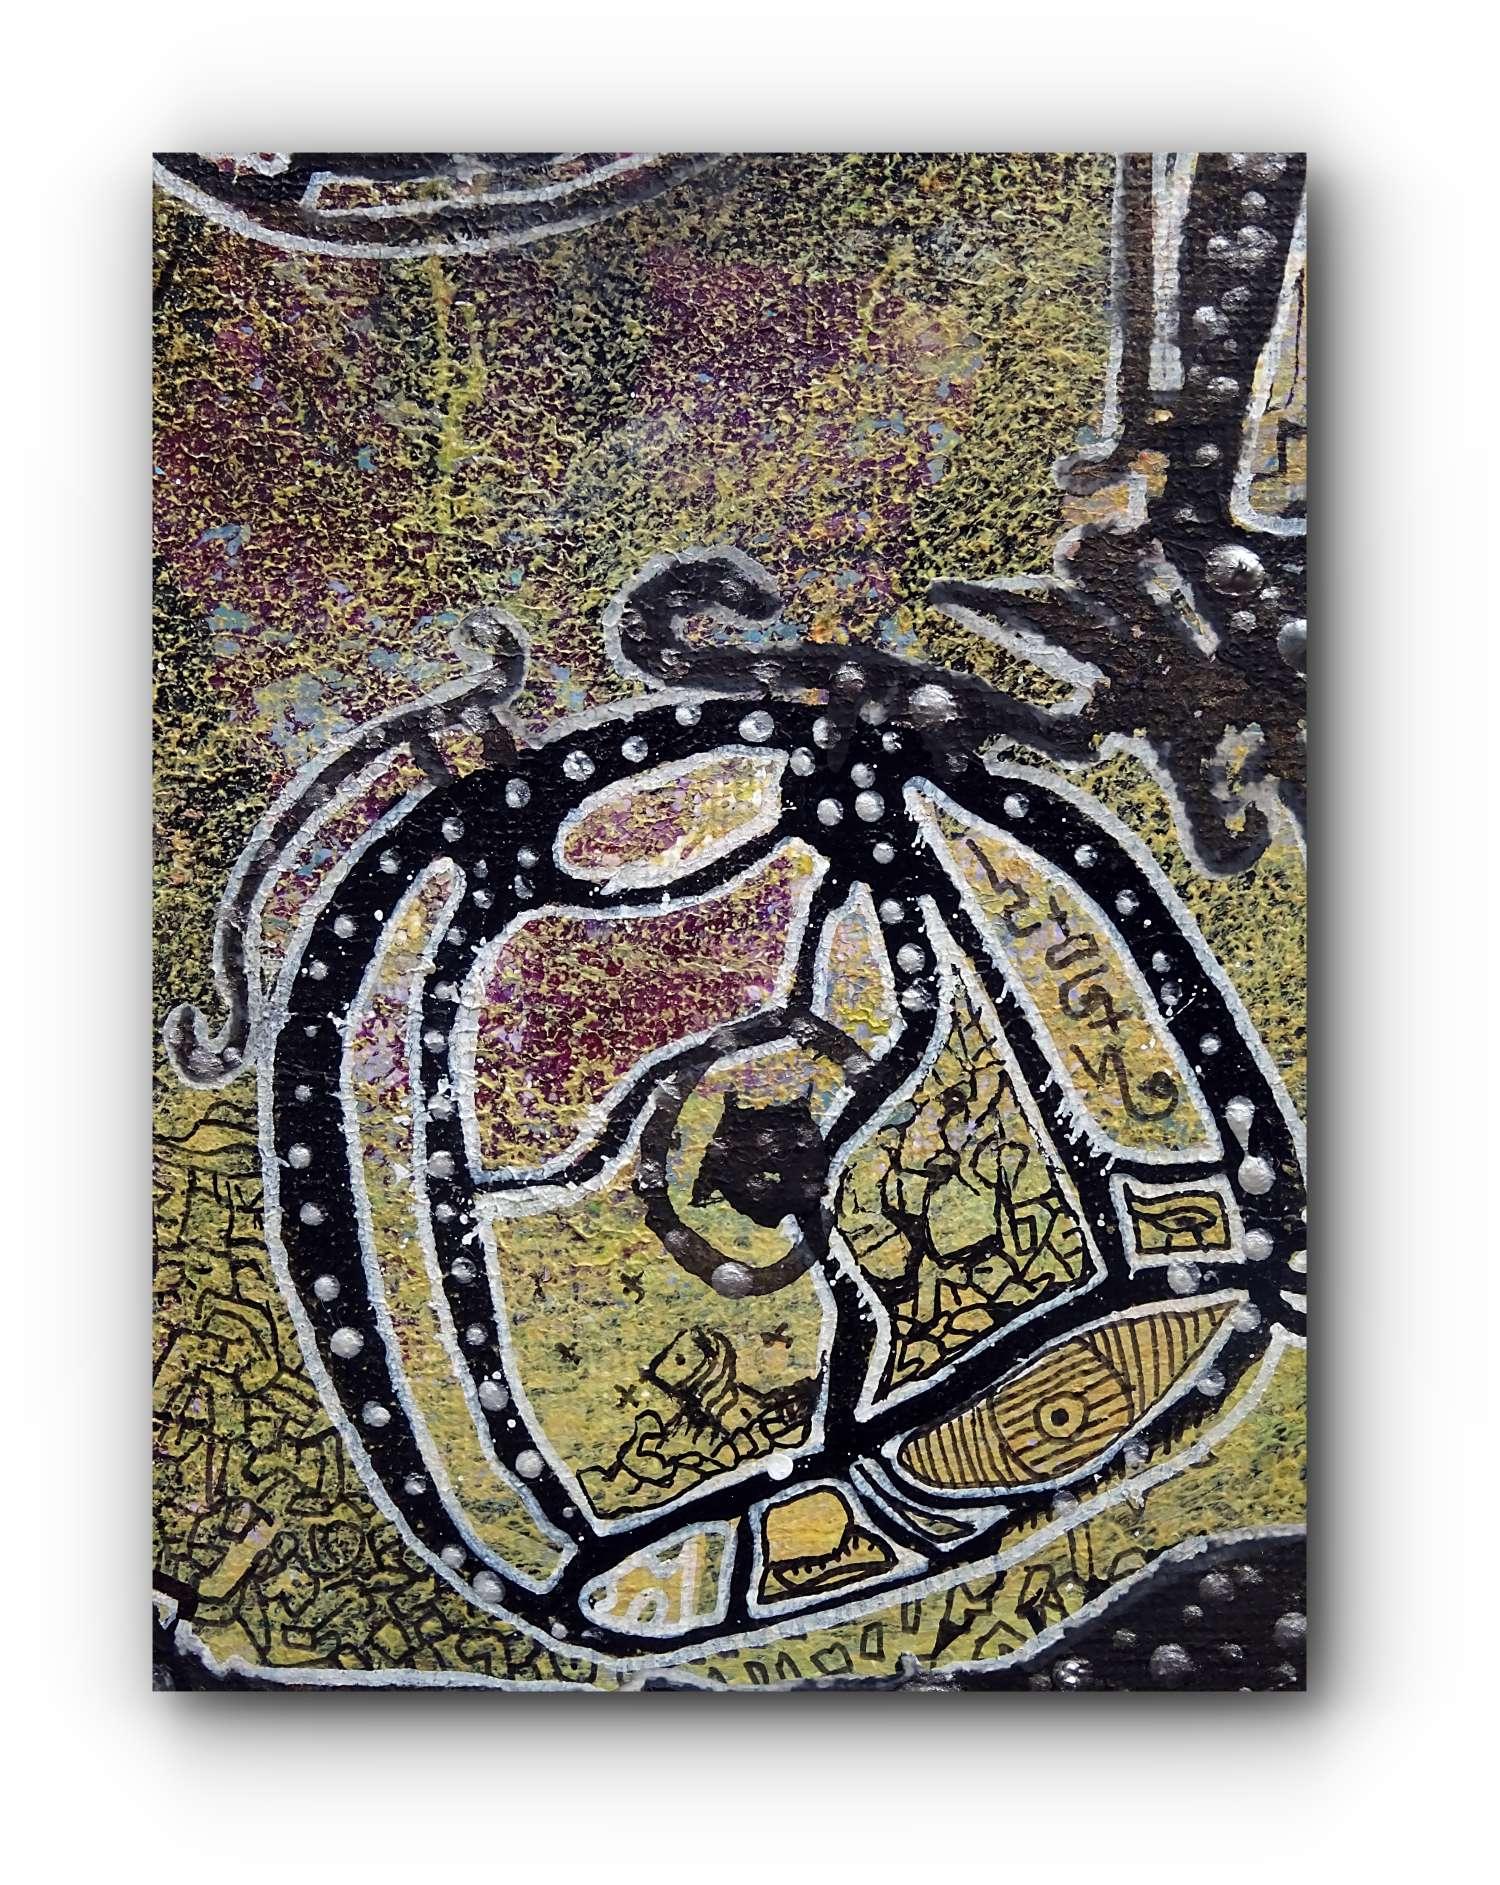 painting-detail-16-desert-dwellers-artists-ingress-vortices.jpg